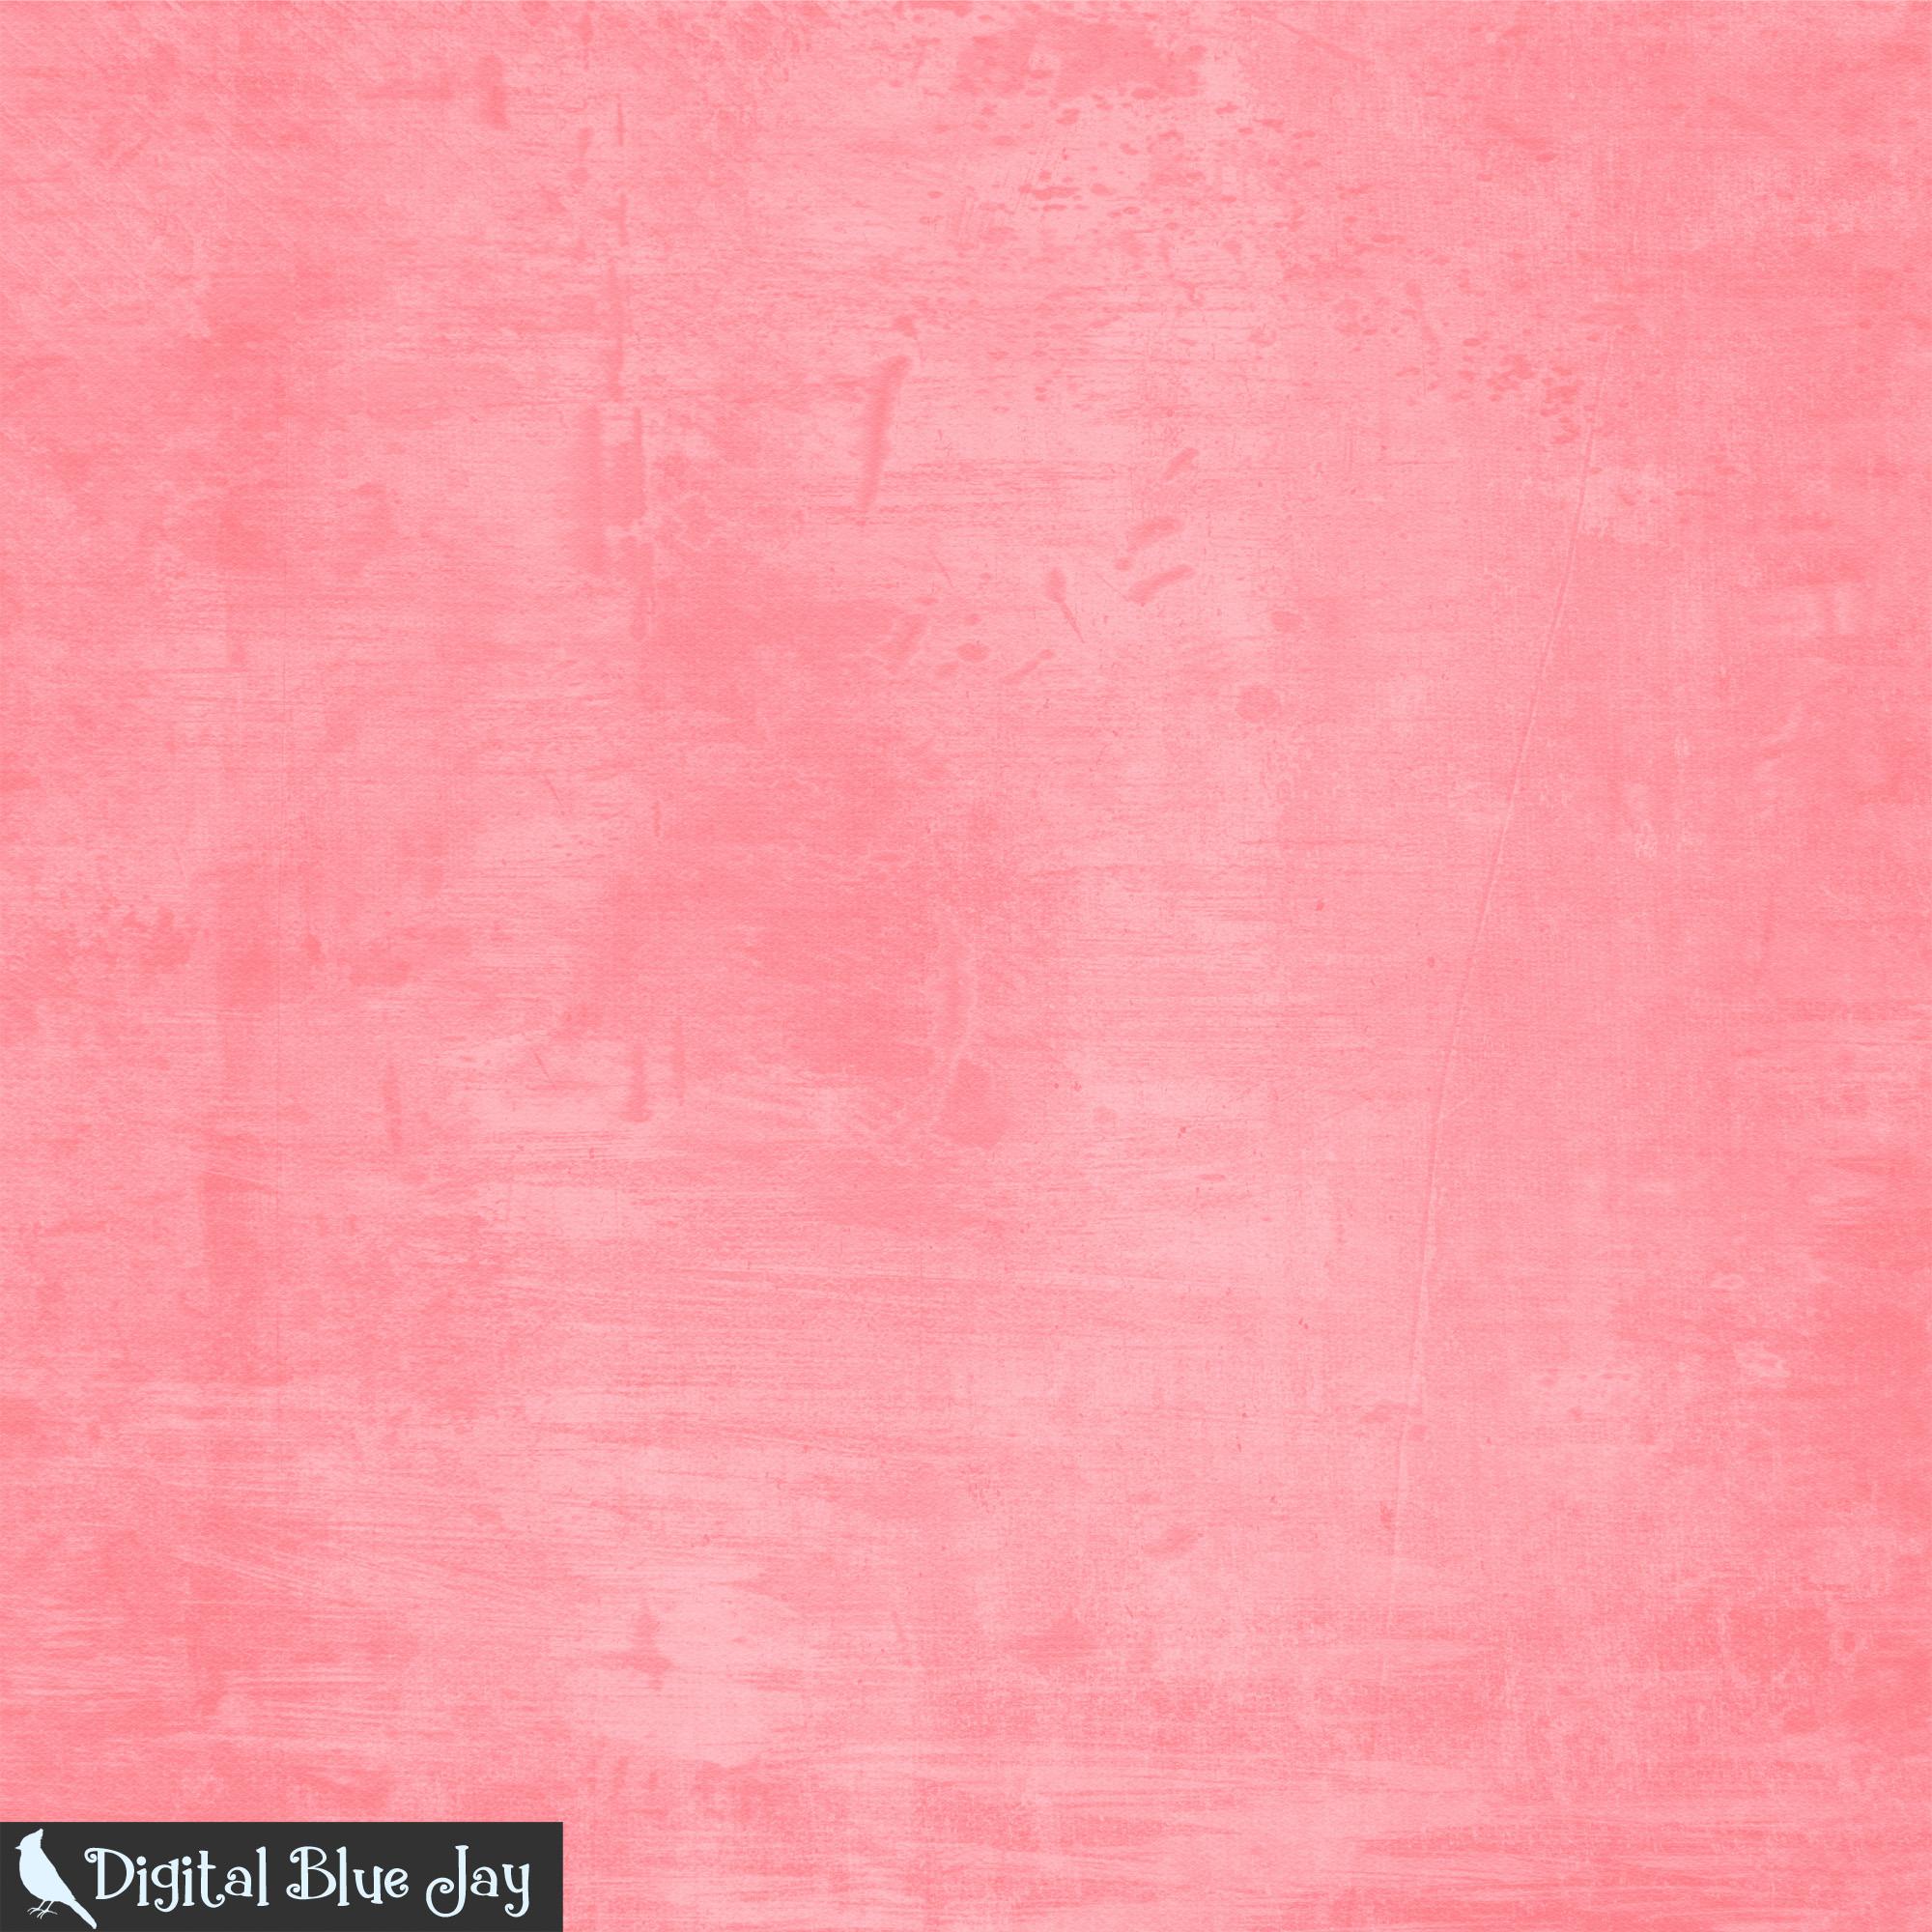 Digital Paper Textured Backgrounds - Summer School example image 2